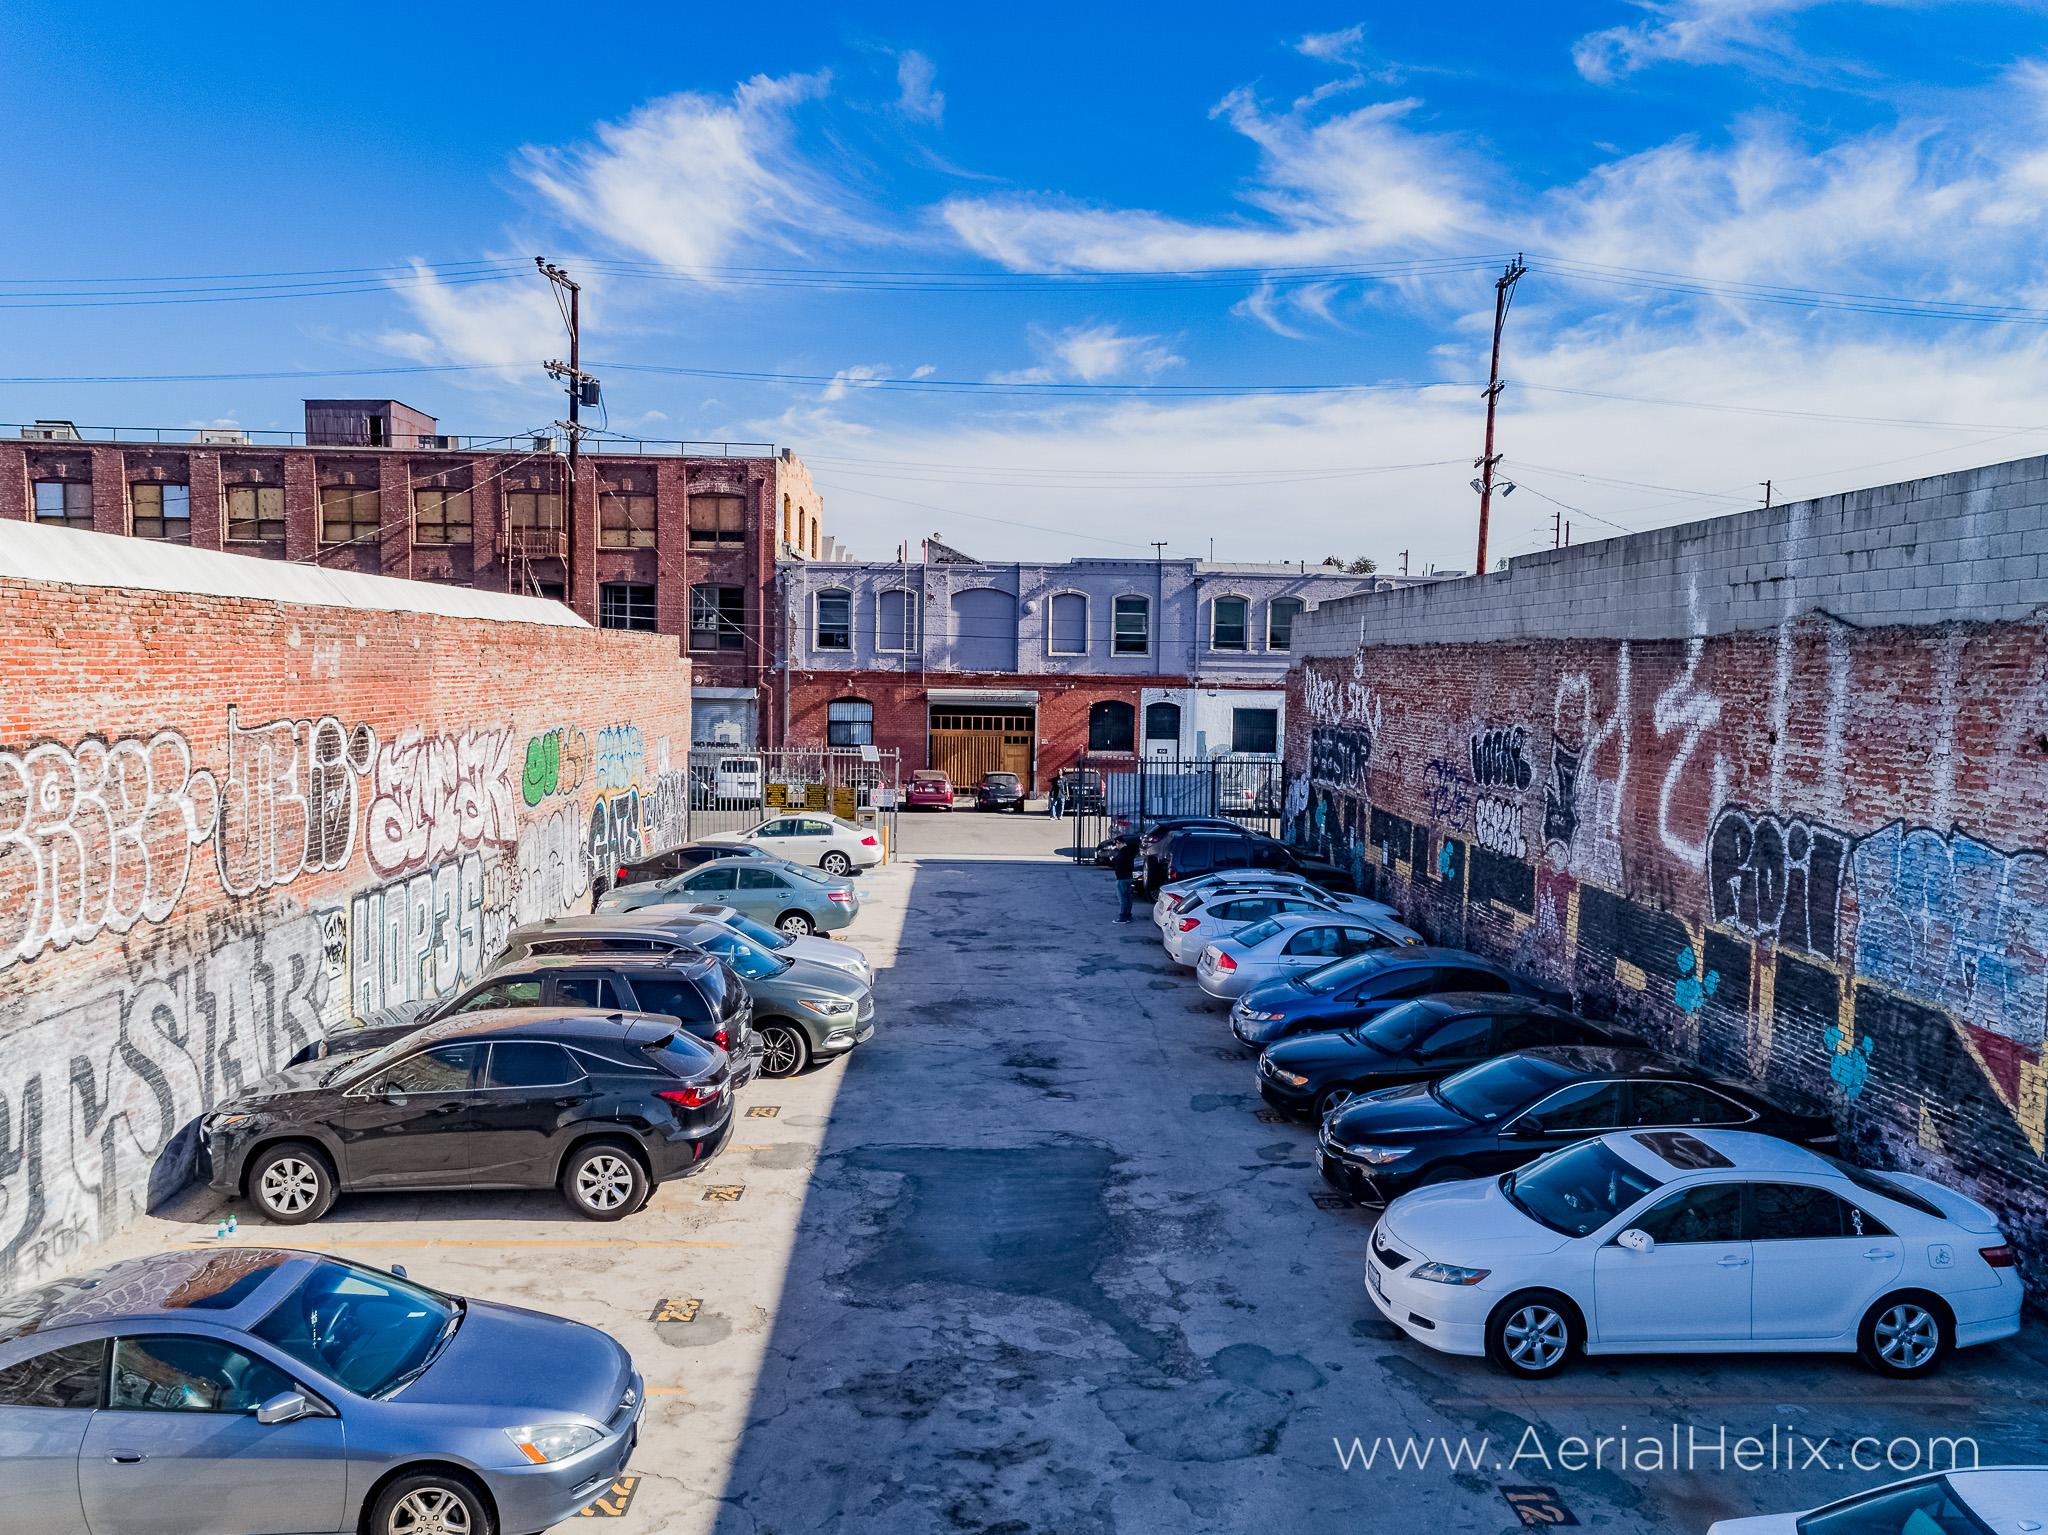 Perfect Parking 2 aerial photographer-21.jpg